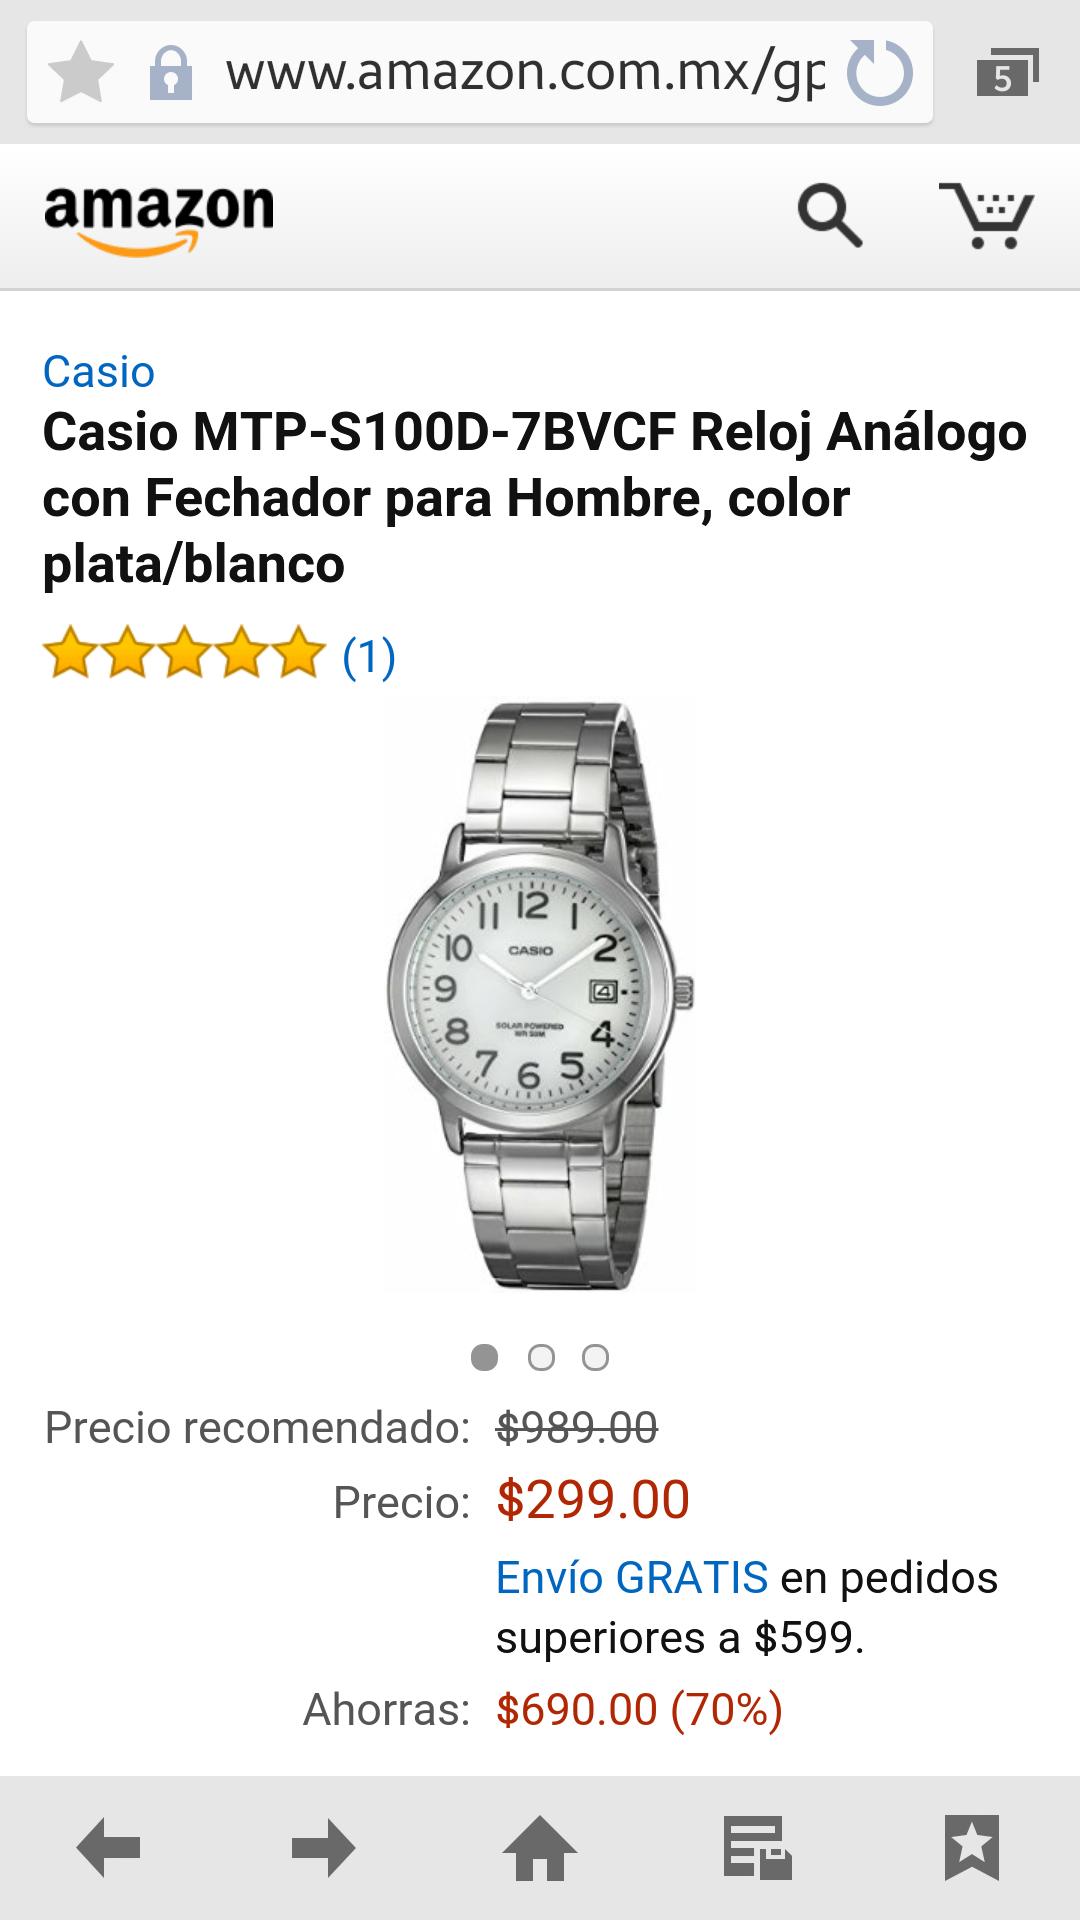 Amazon: Reloj Análogo Casio modelo MTP-S100D-7BVCF Acero Inoxidable a $299